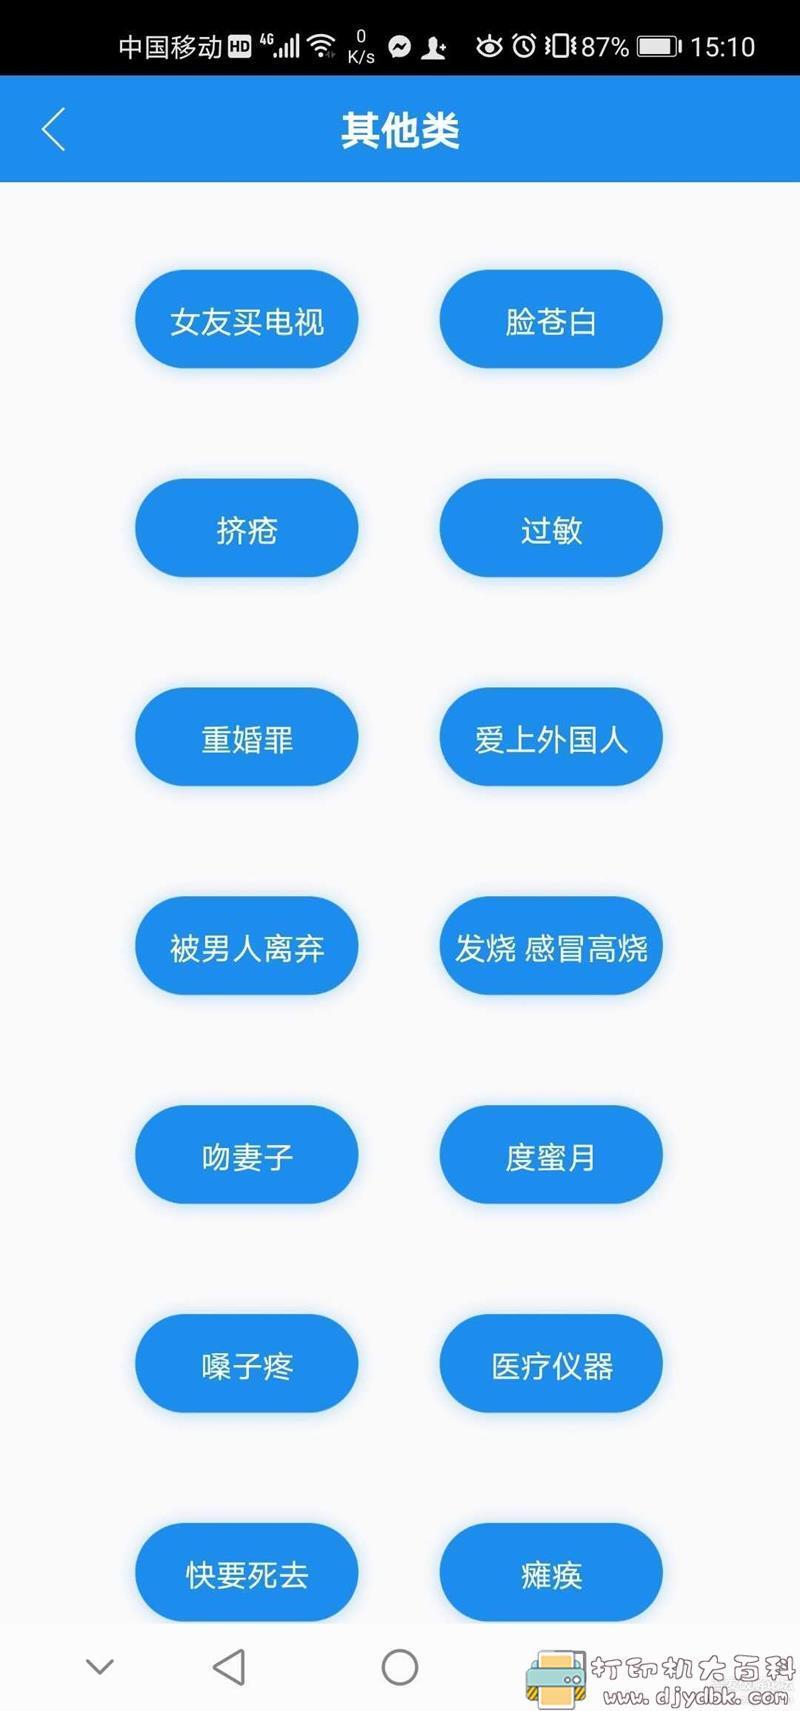 [Android]【周公解梦app】解梦预测图片 No.3